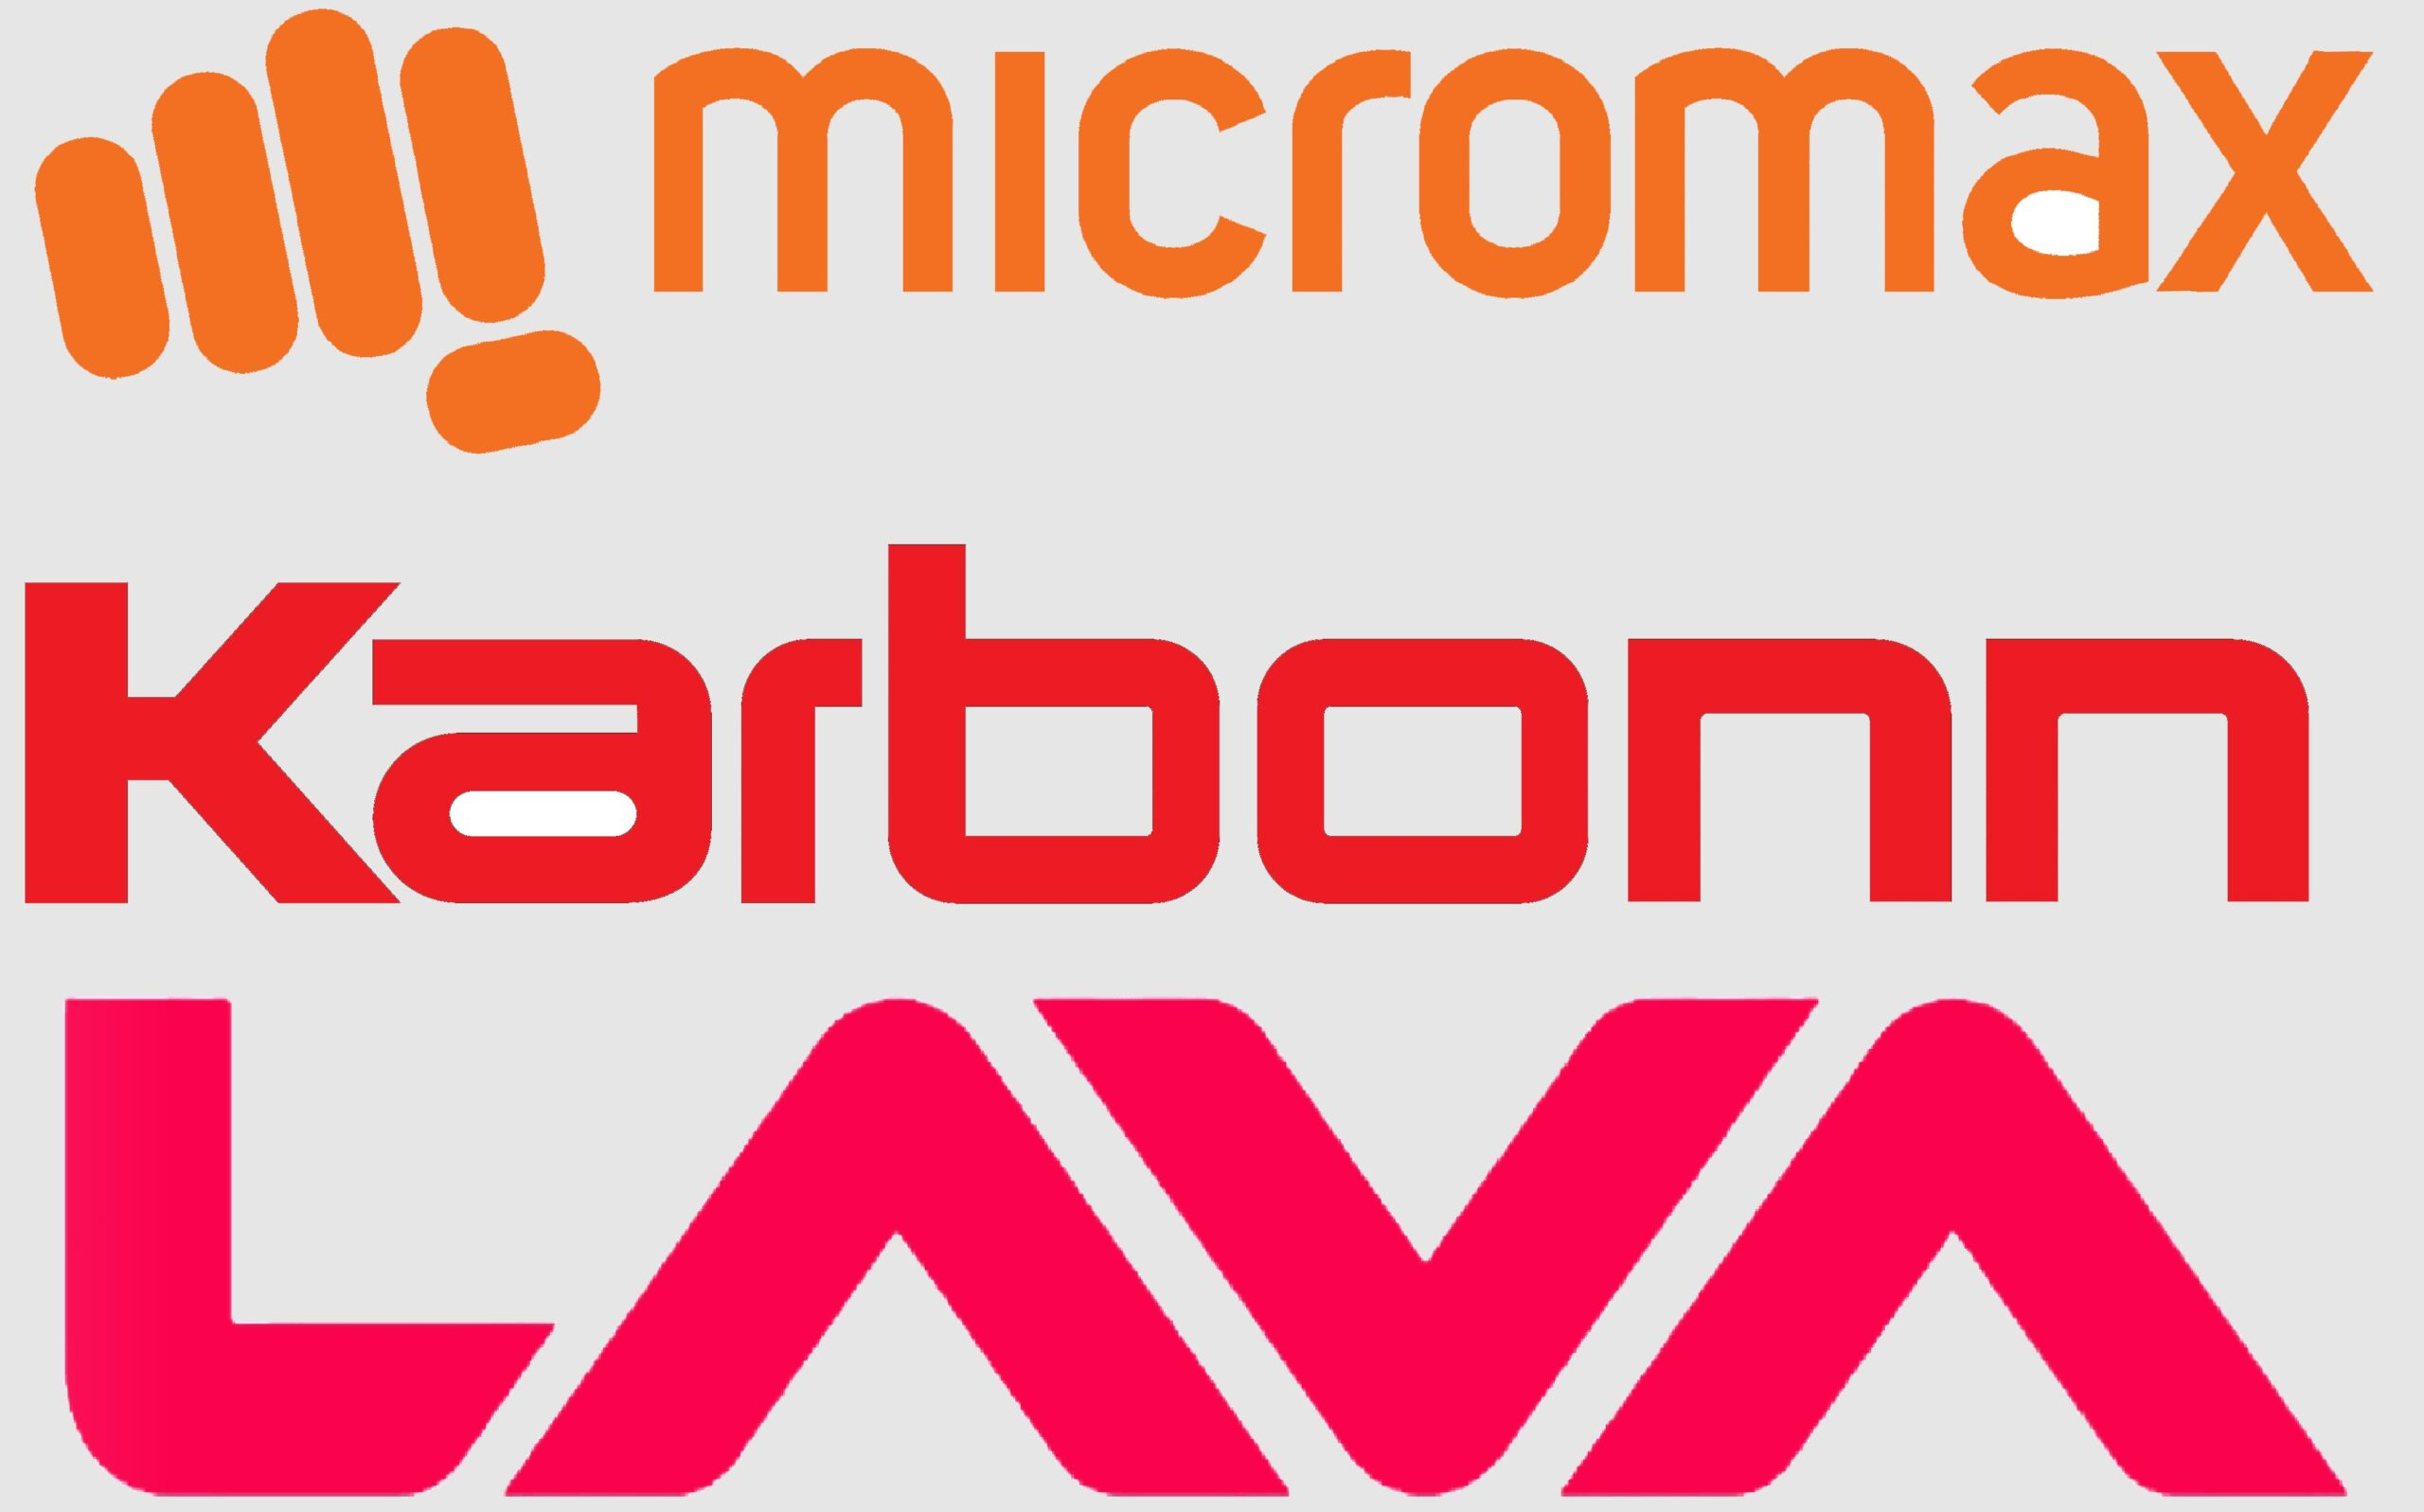 Micromax Karbonn Lava logos scaled